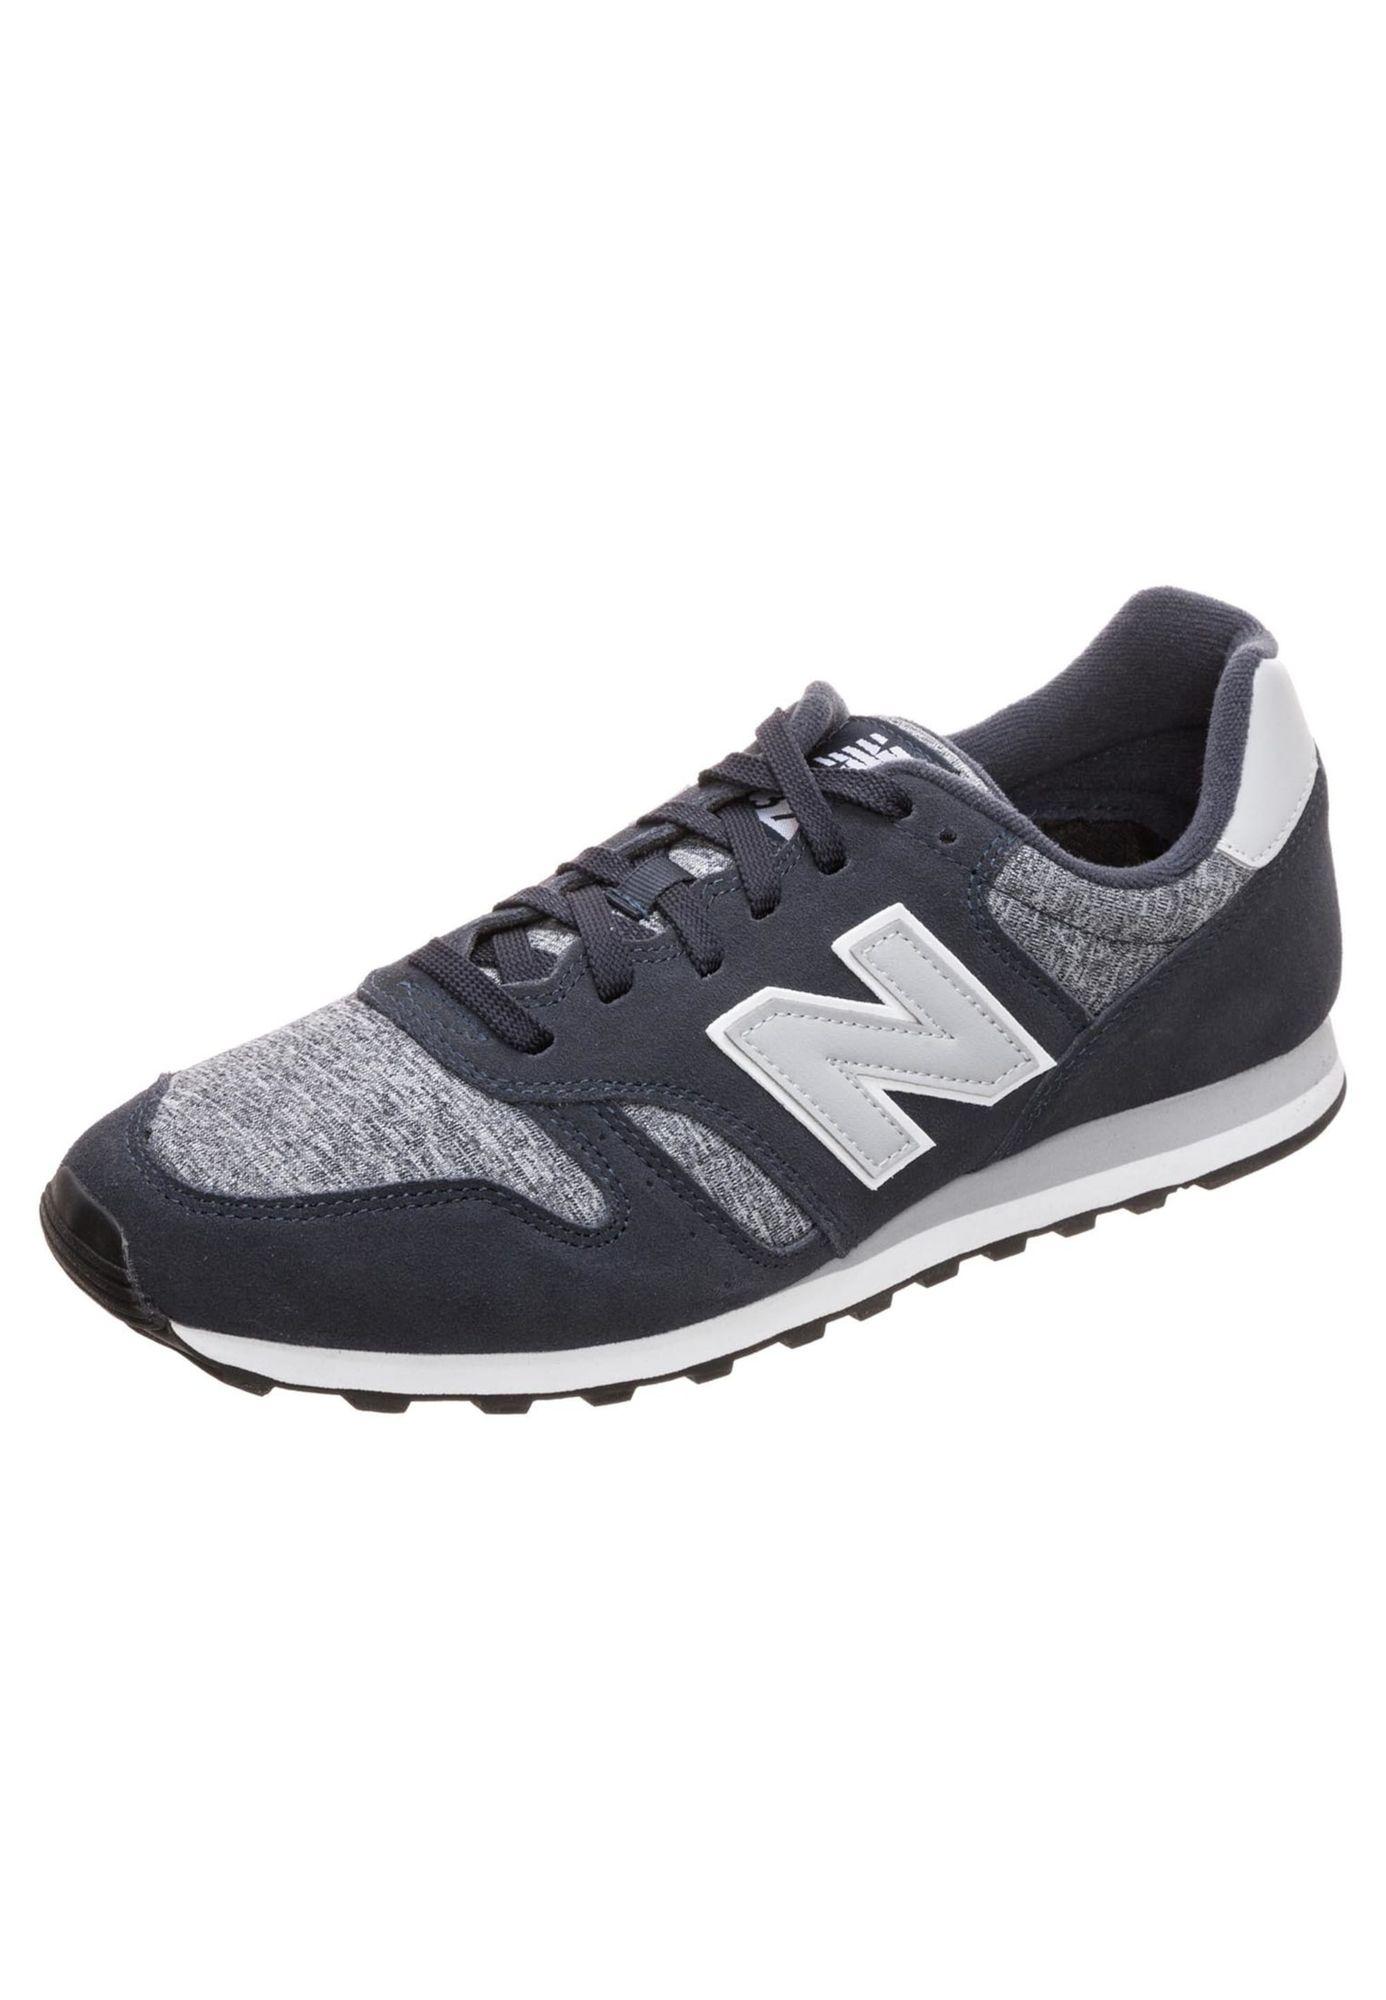 ML373-NJR-D Sneaker